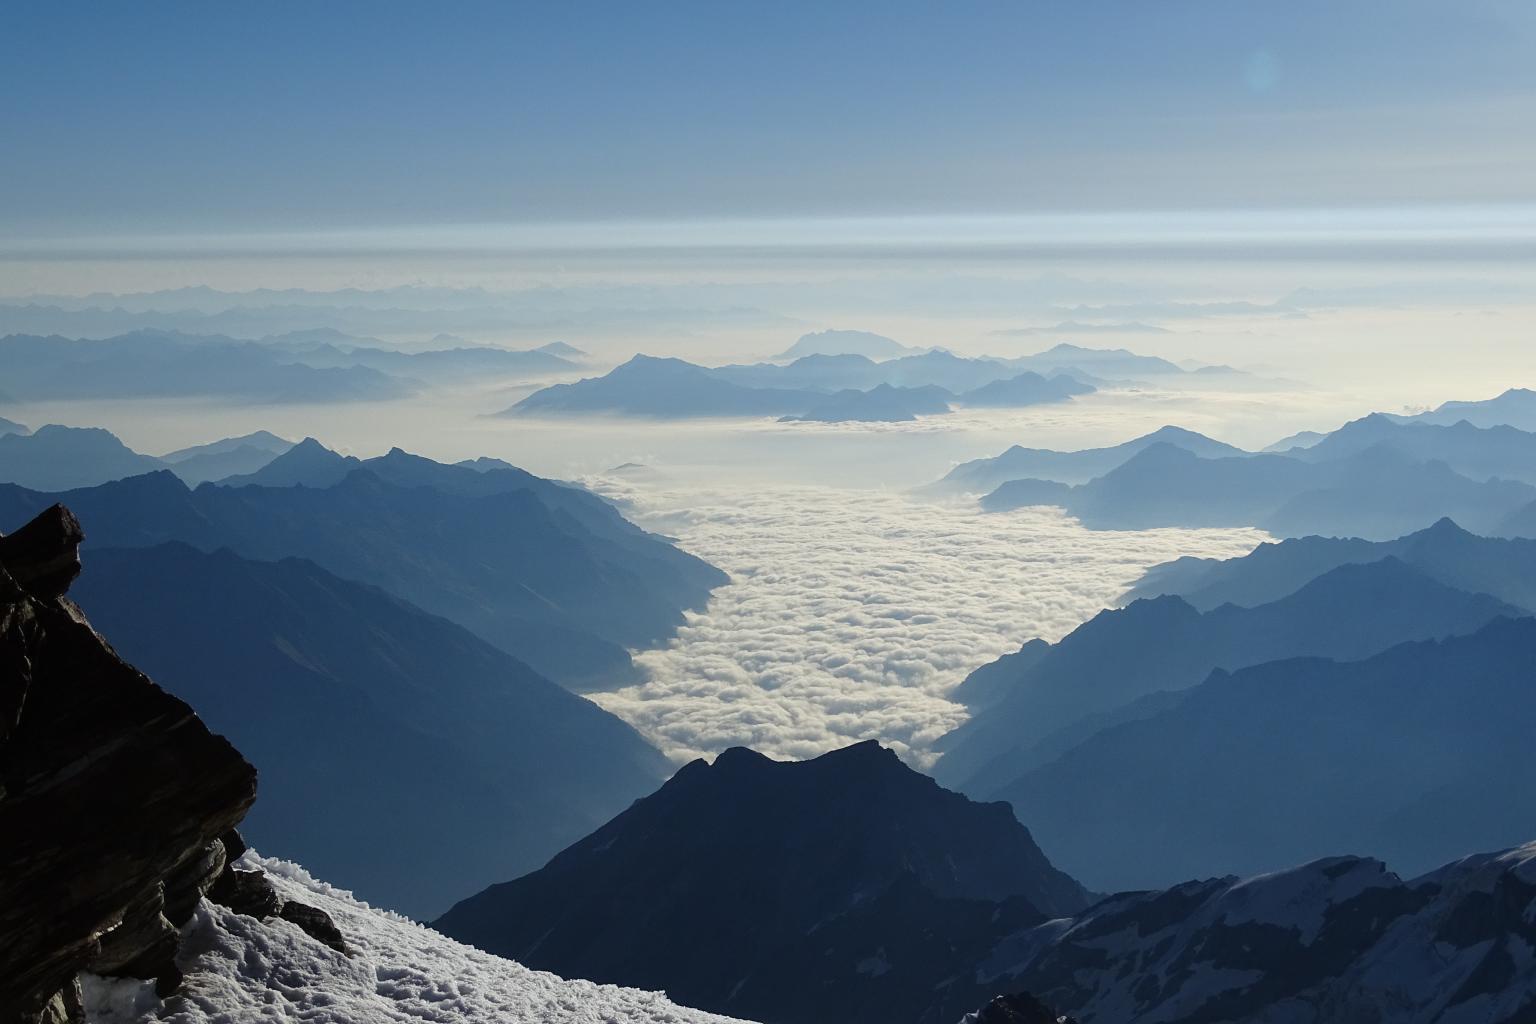 mare di nubi sulla Valsesia